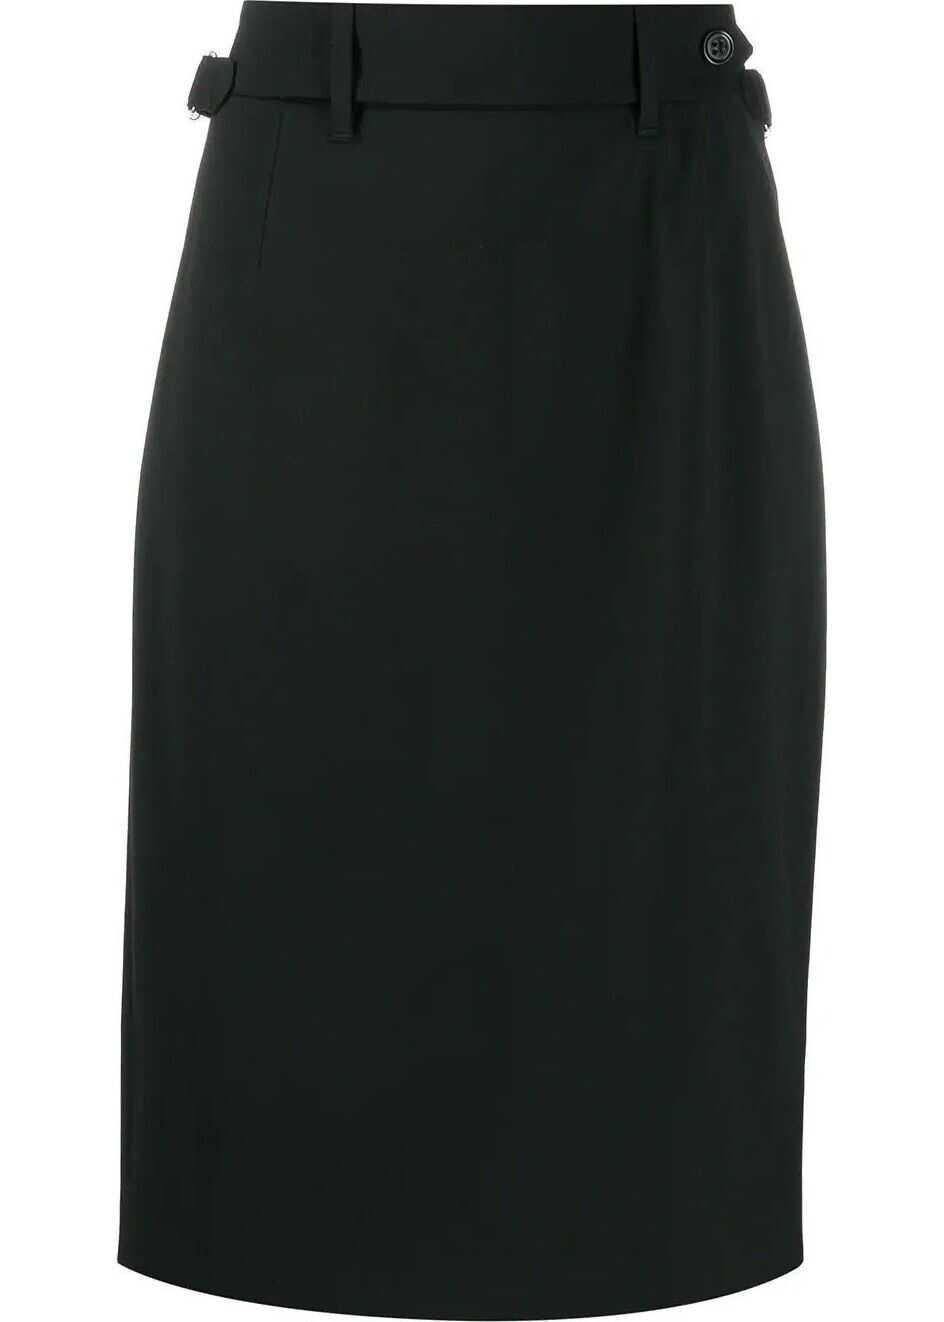 RED VALENTINO Viscose Skirt BLACK